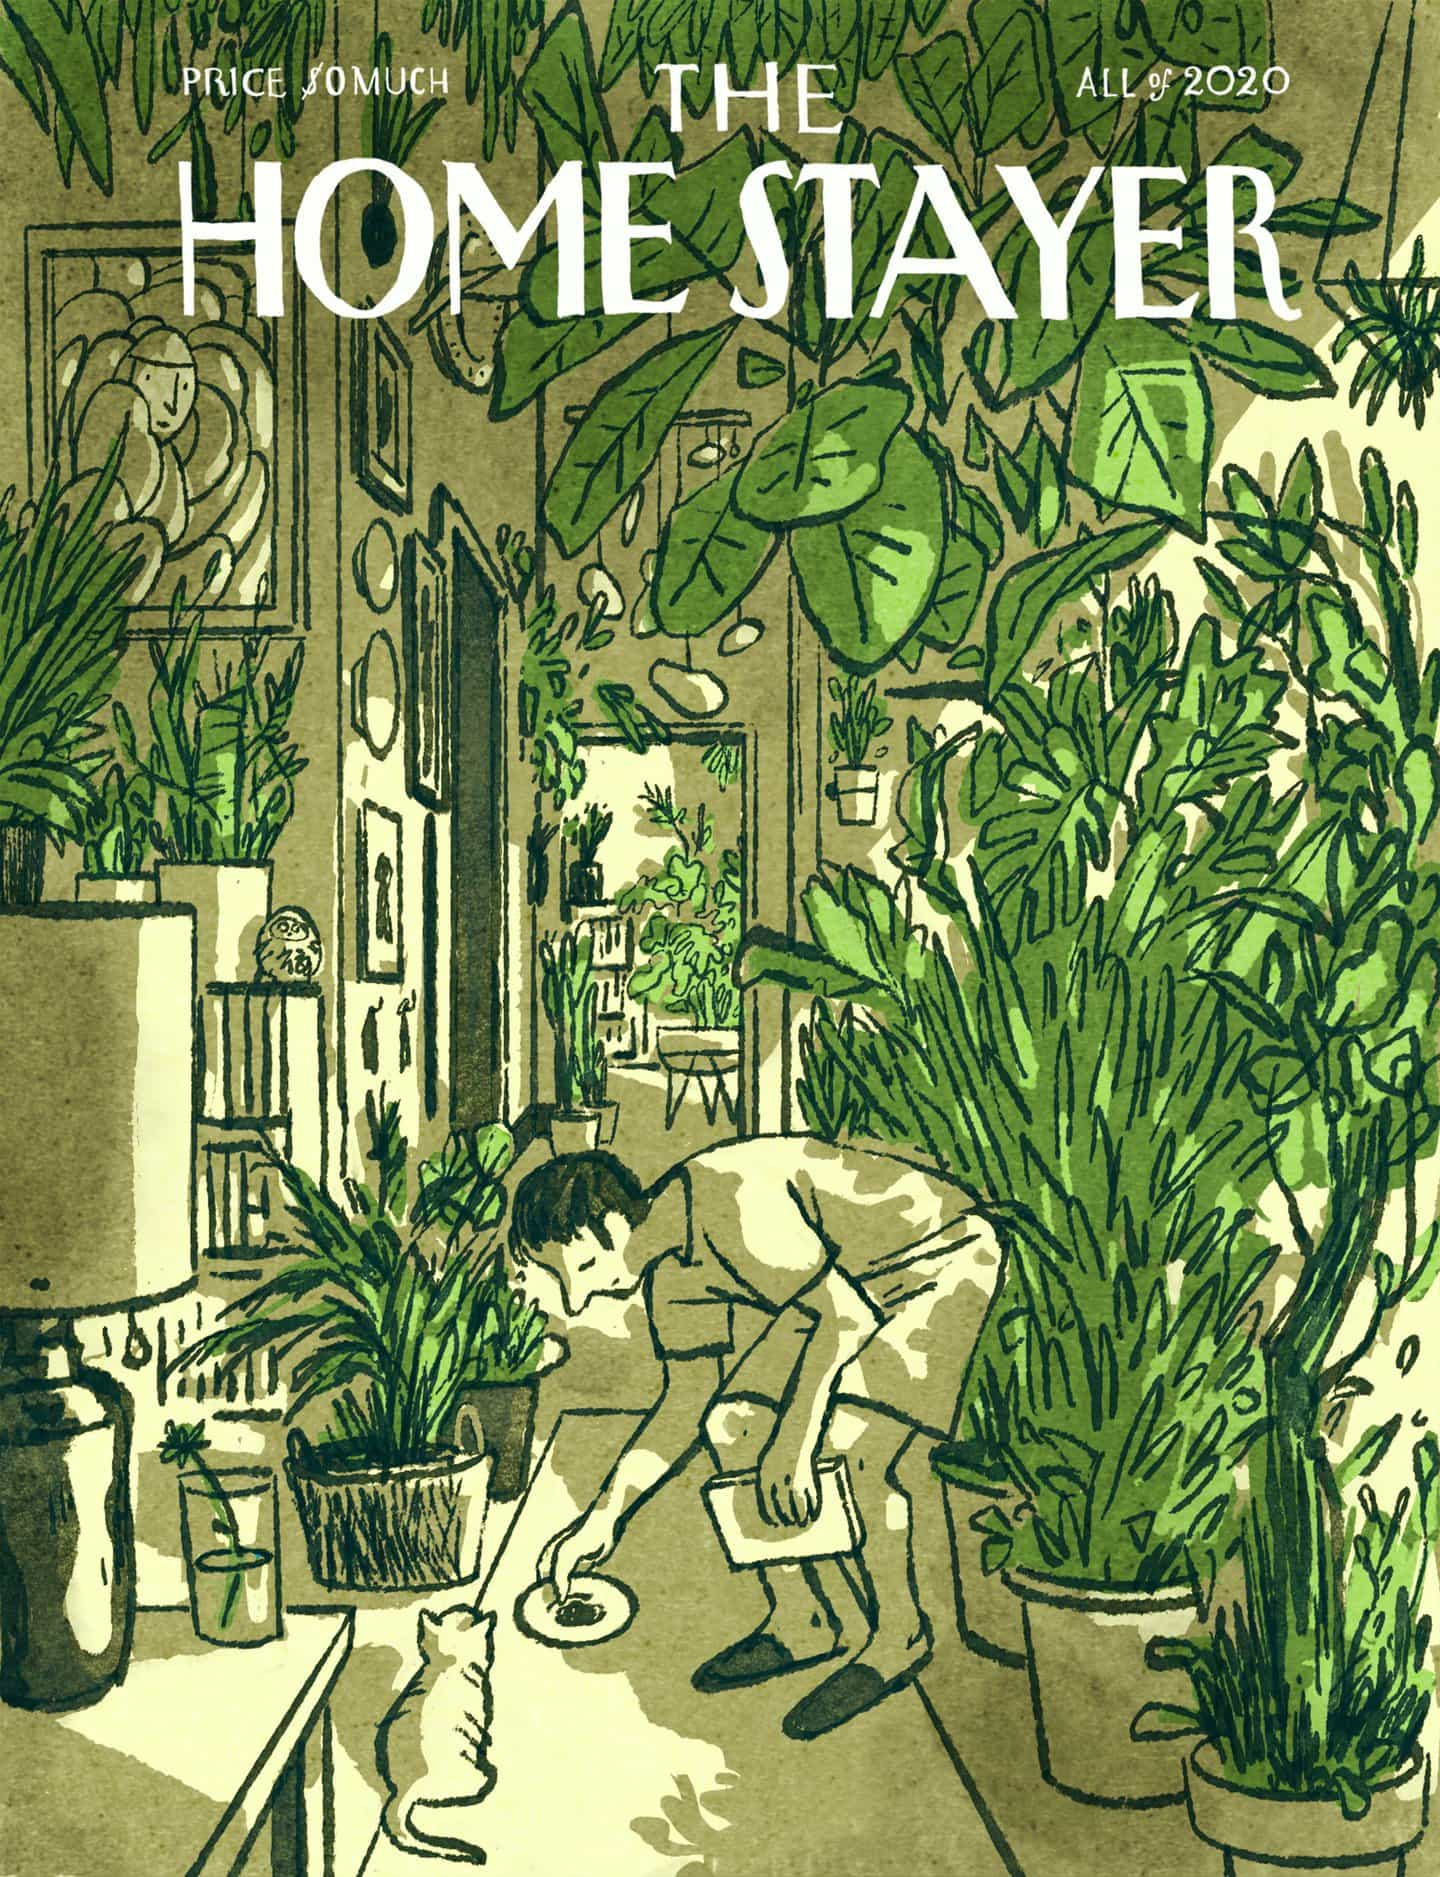 Luis Mendo: Homestayer Issue 3: GROW (Copyright © Luis Mendo 2020)